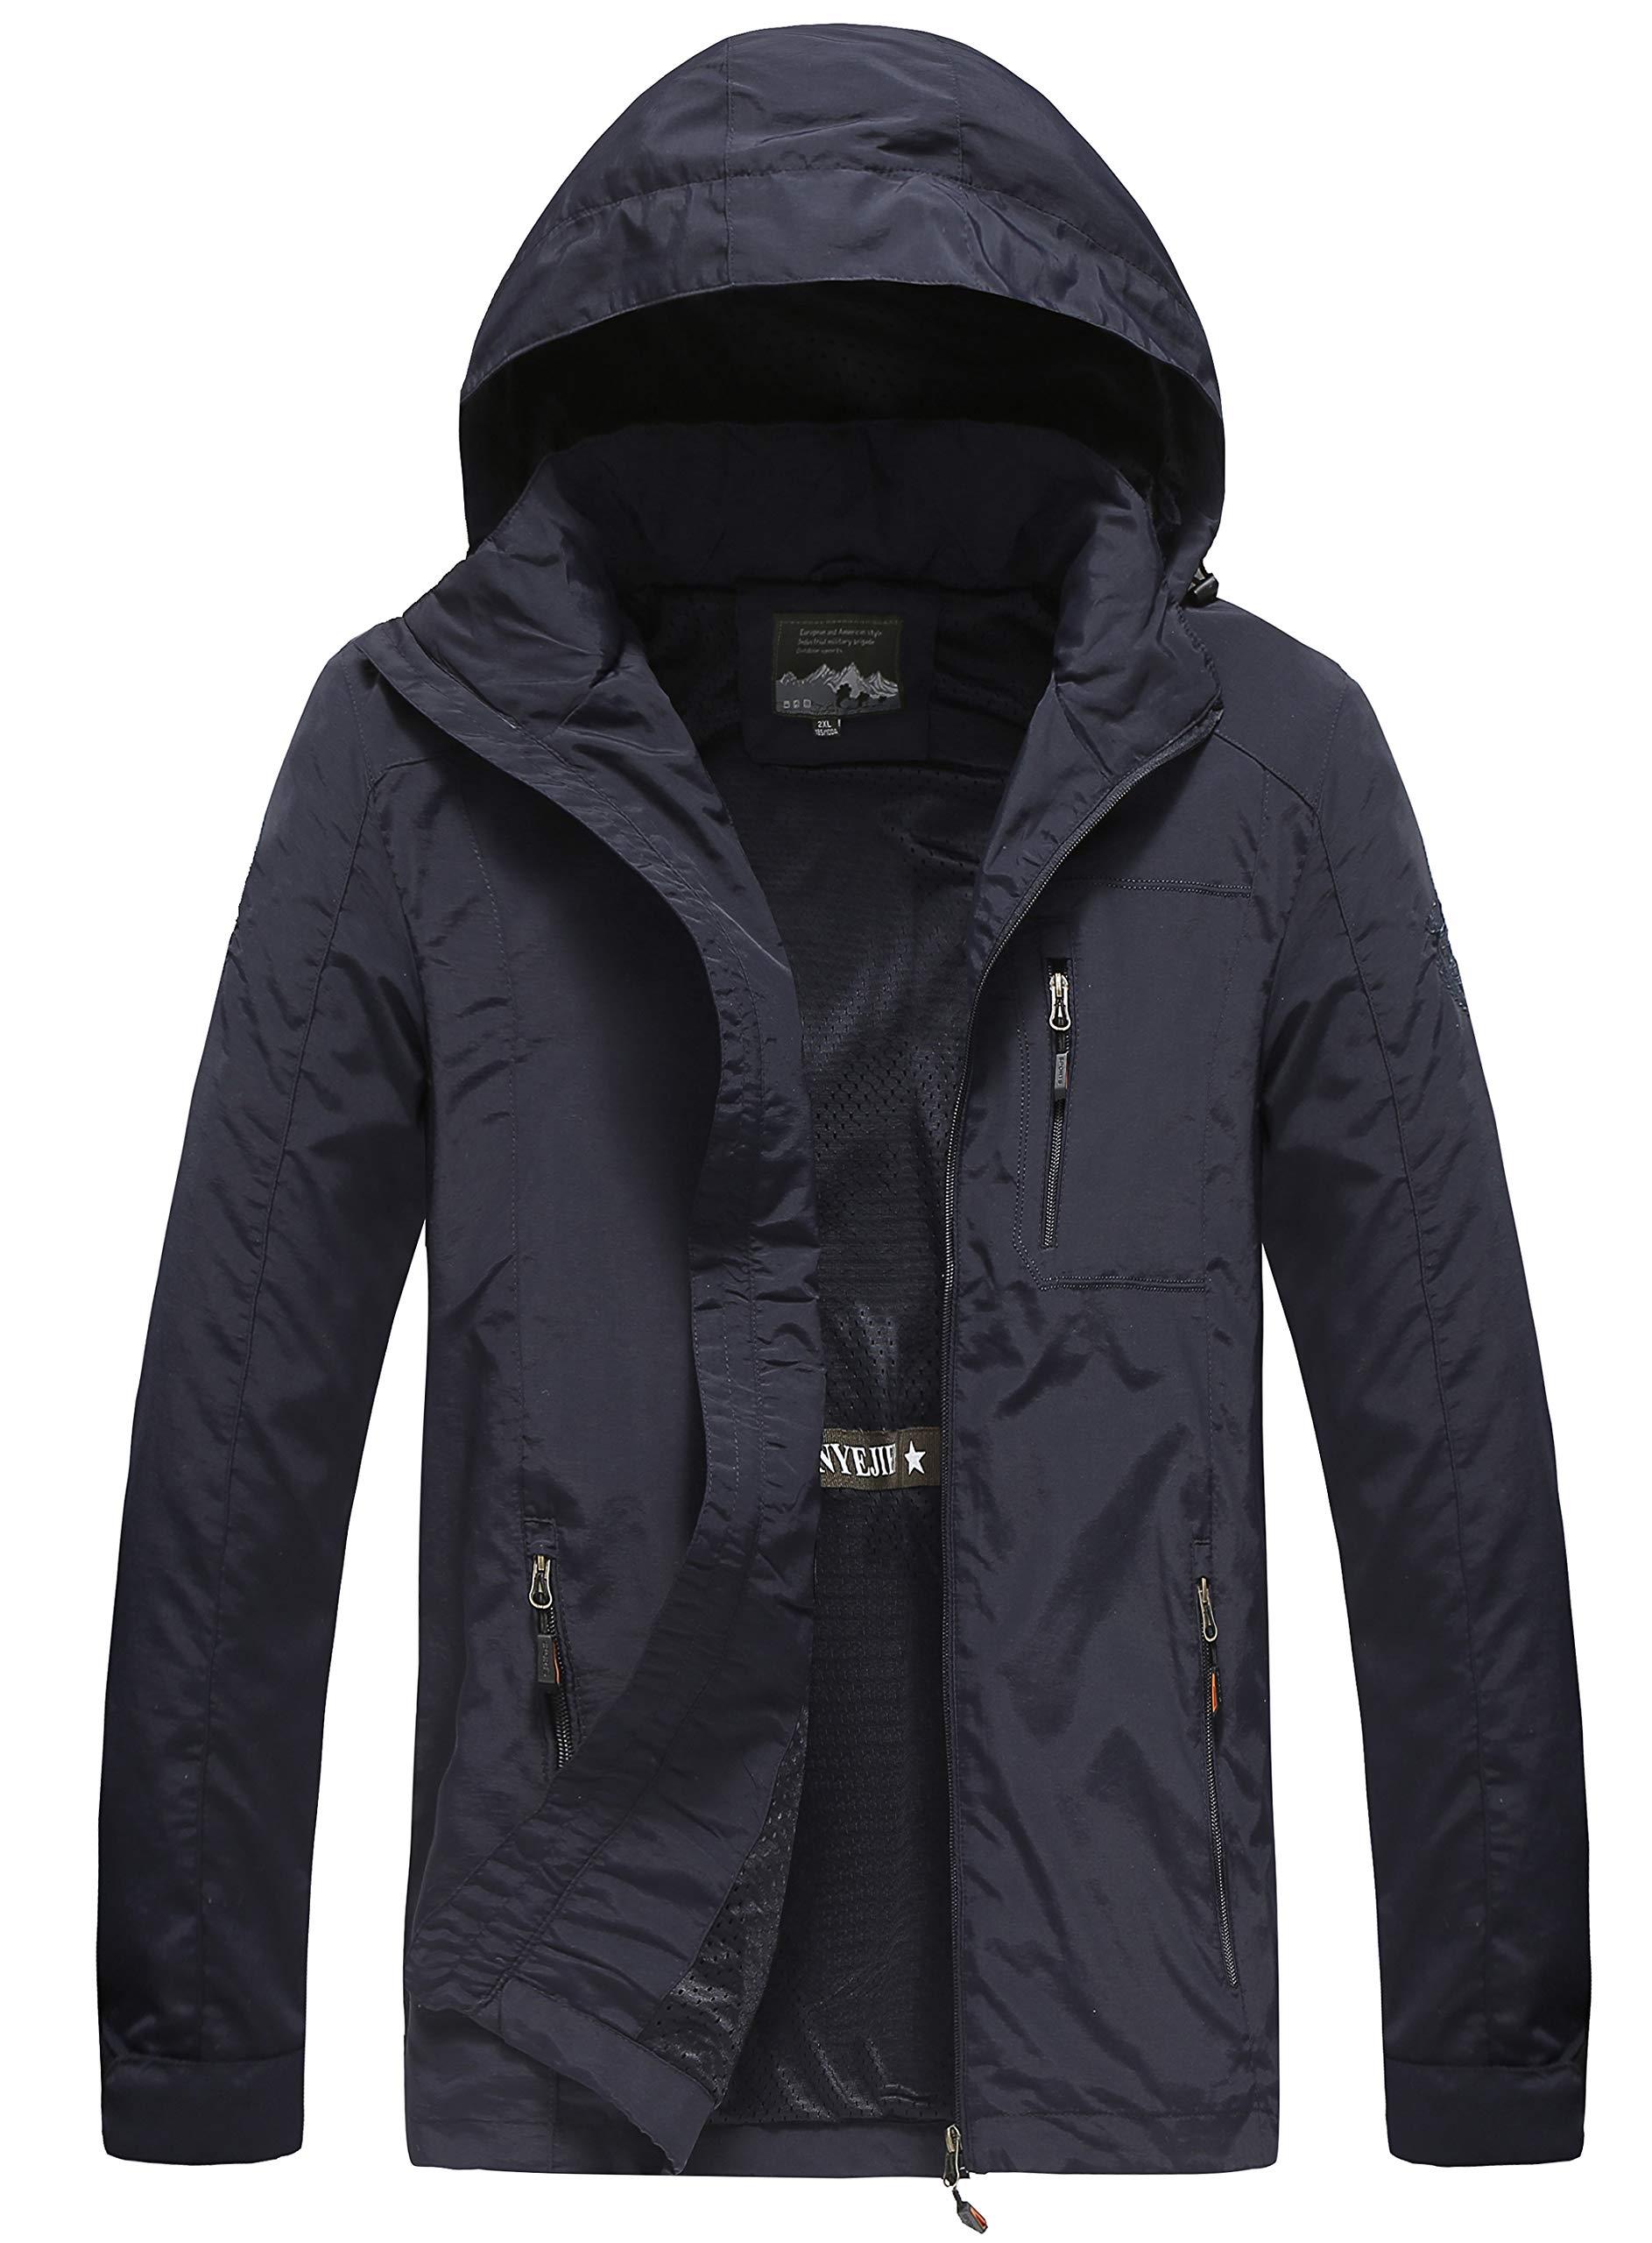 Men's Hooded Lightweight Windbreaker Jacket Softshell Spring Jacket